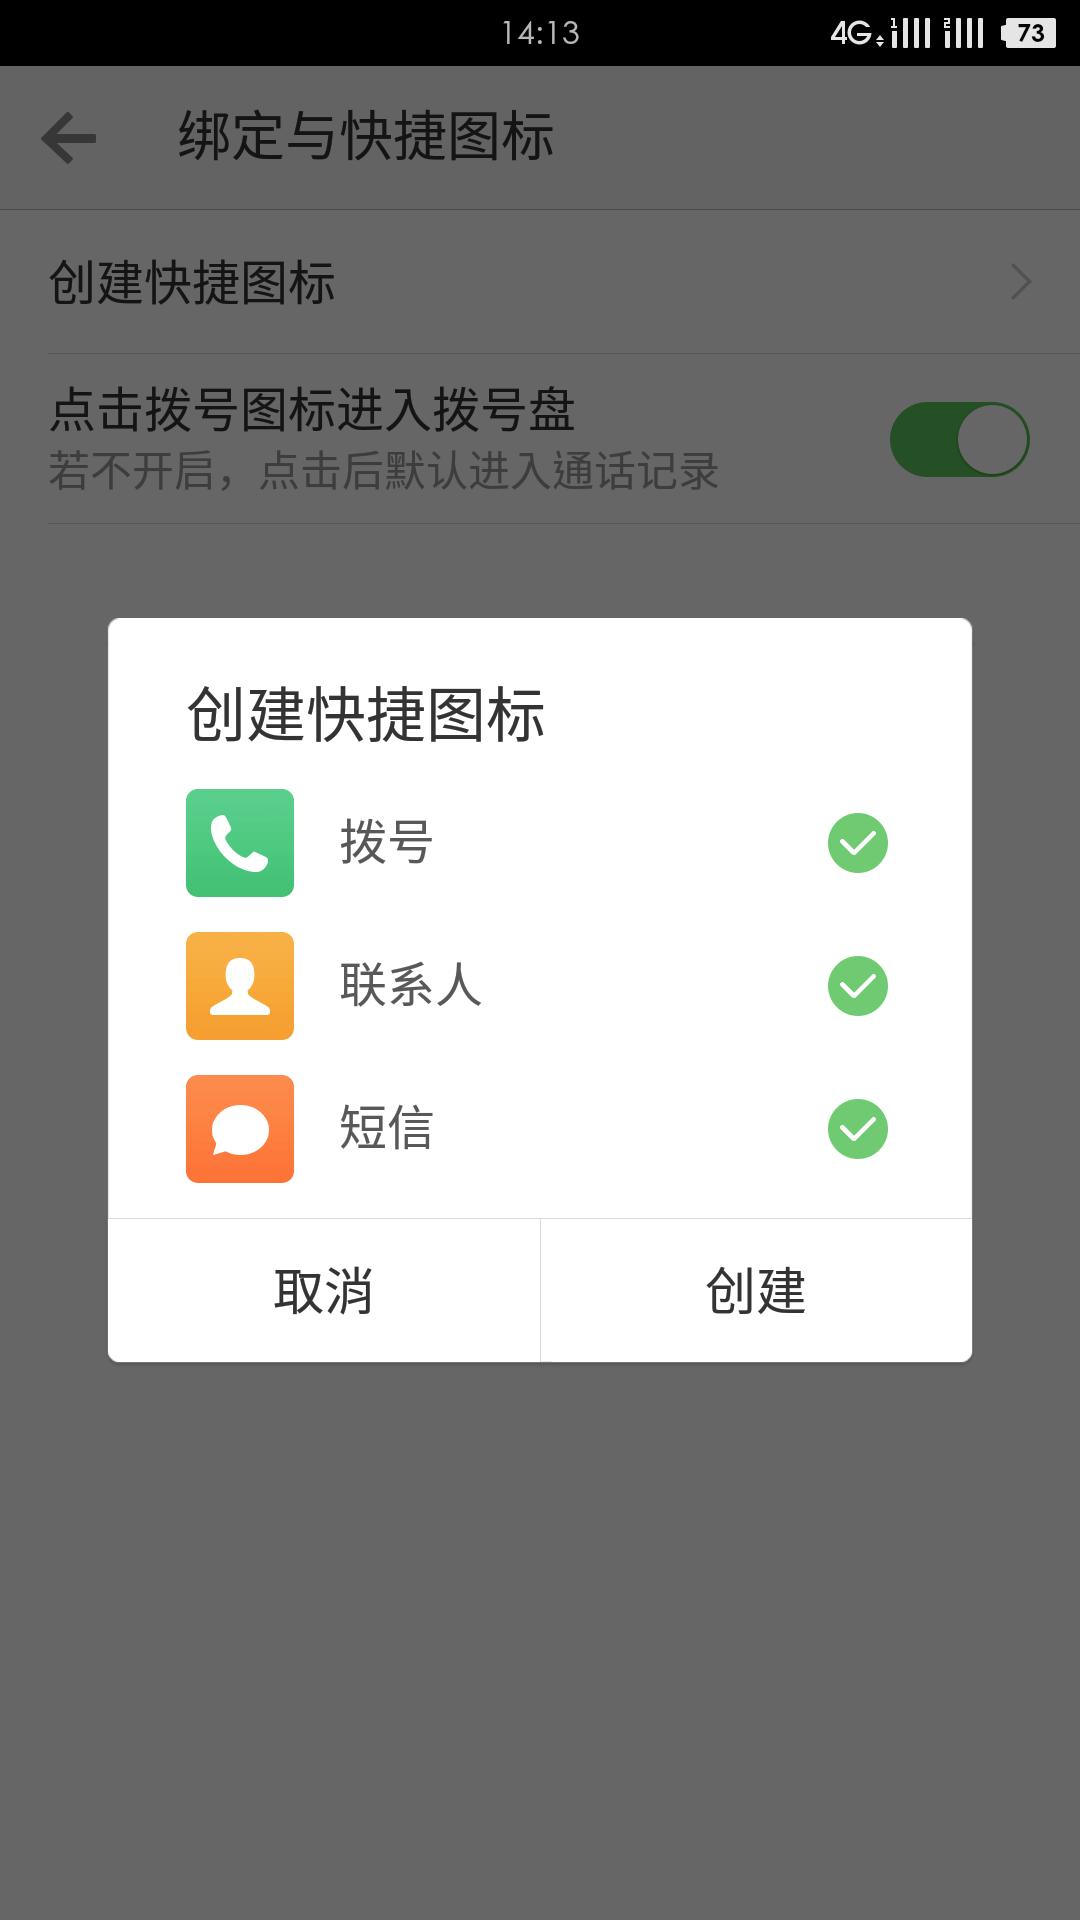 Screenshot_2015-11-22-14-13-08.png